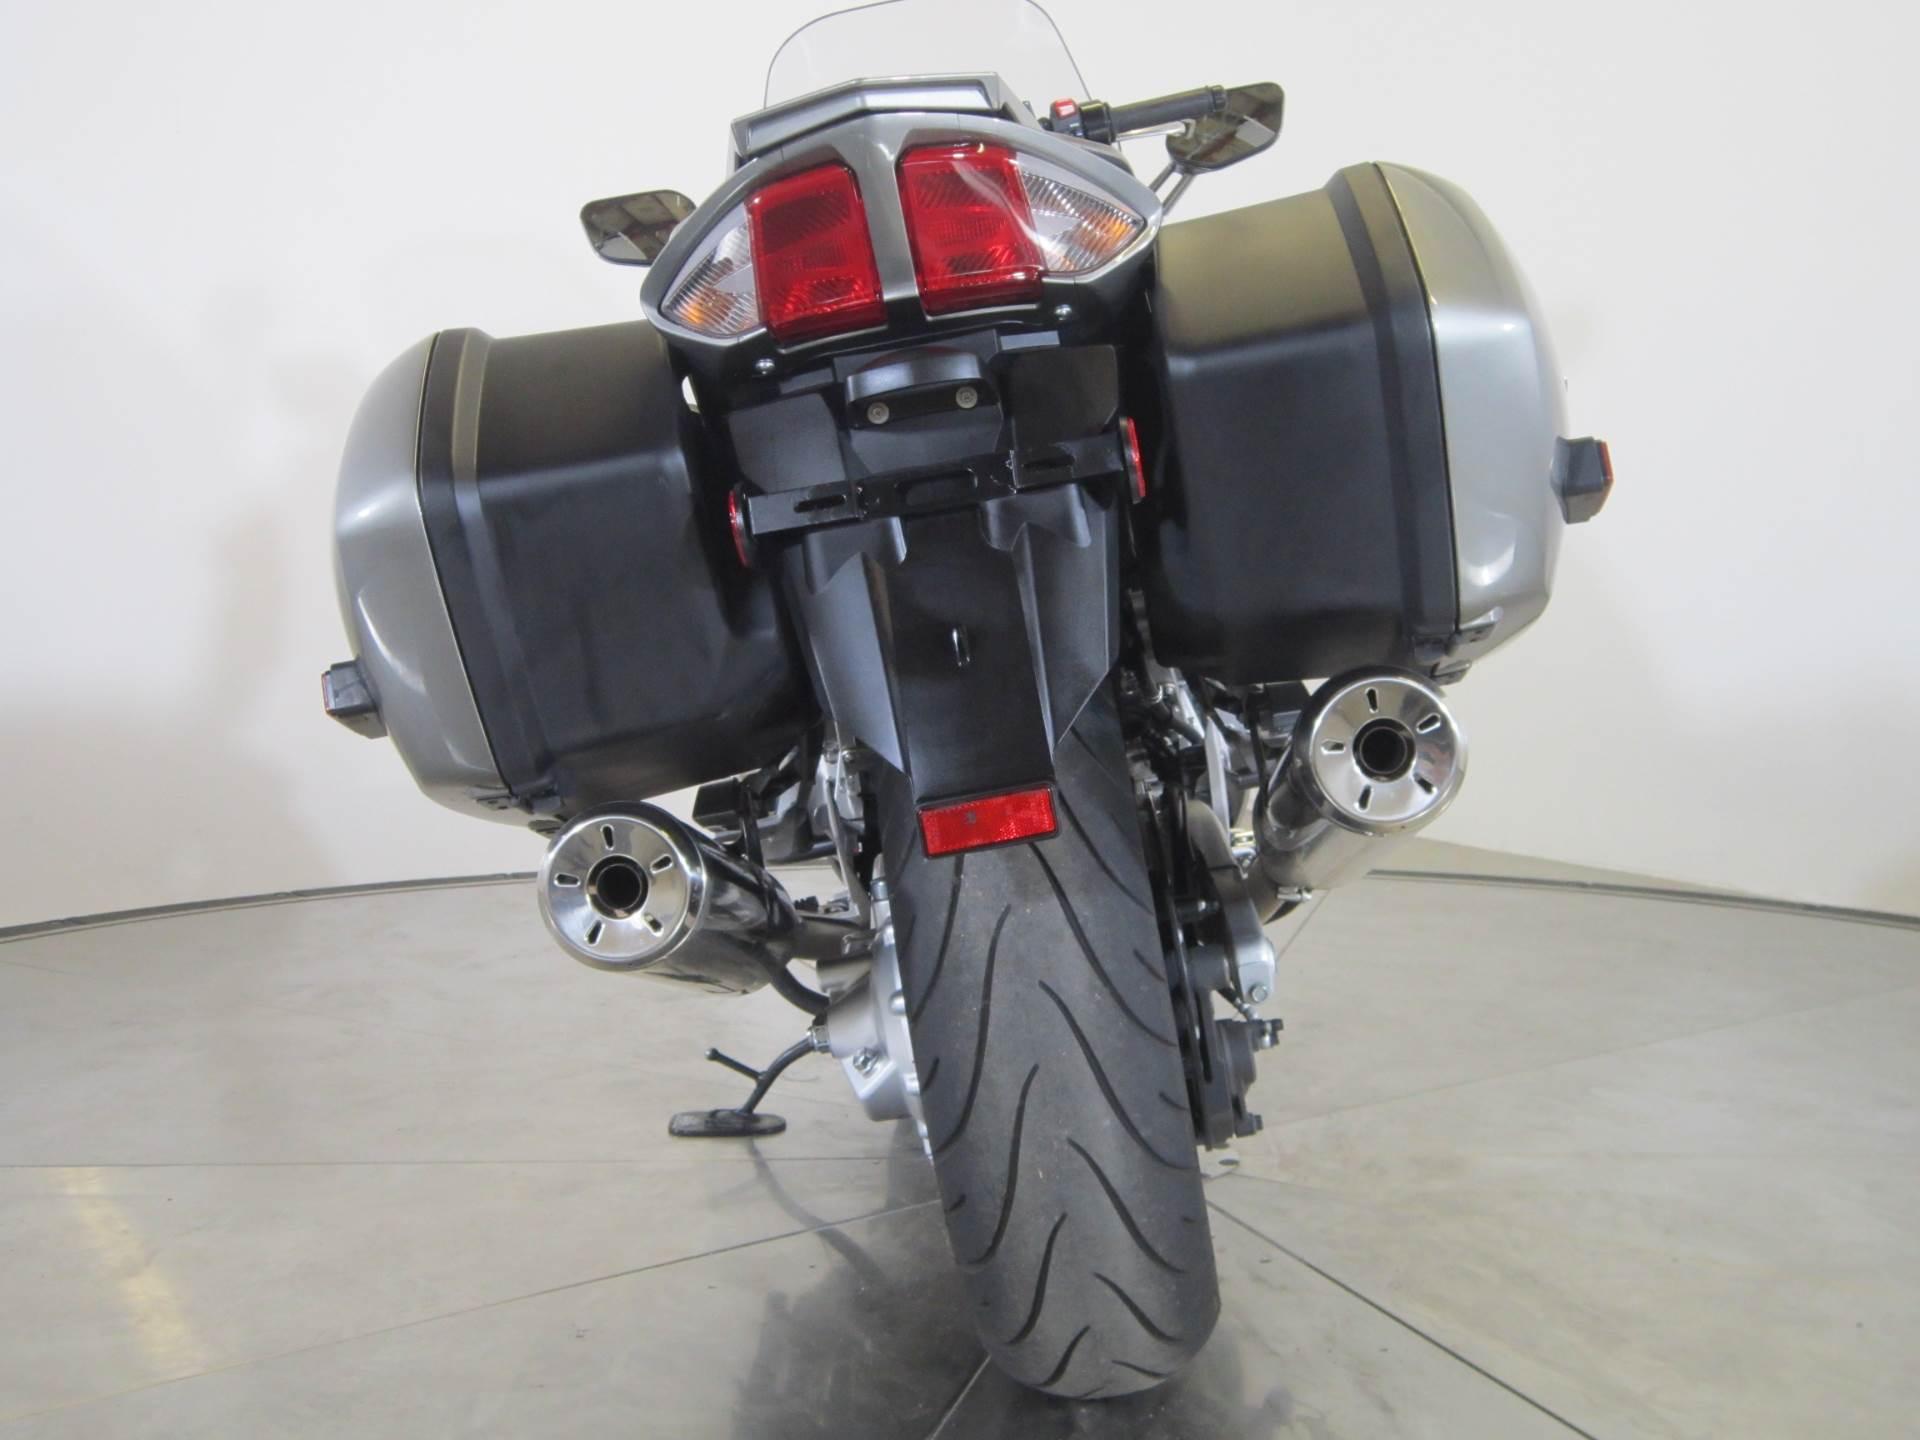 2013 Yamaha FJR1300A 4